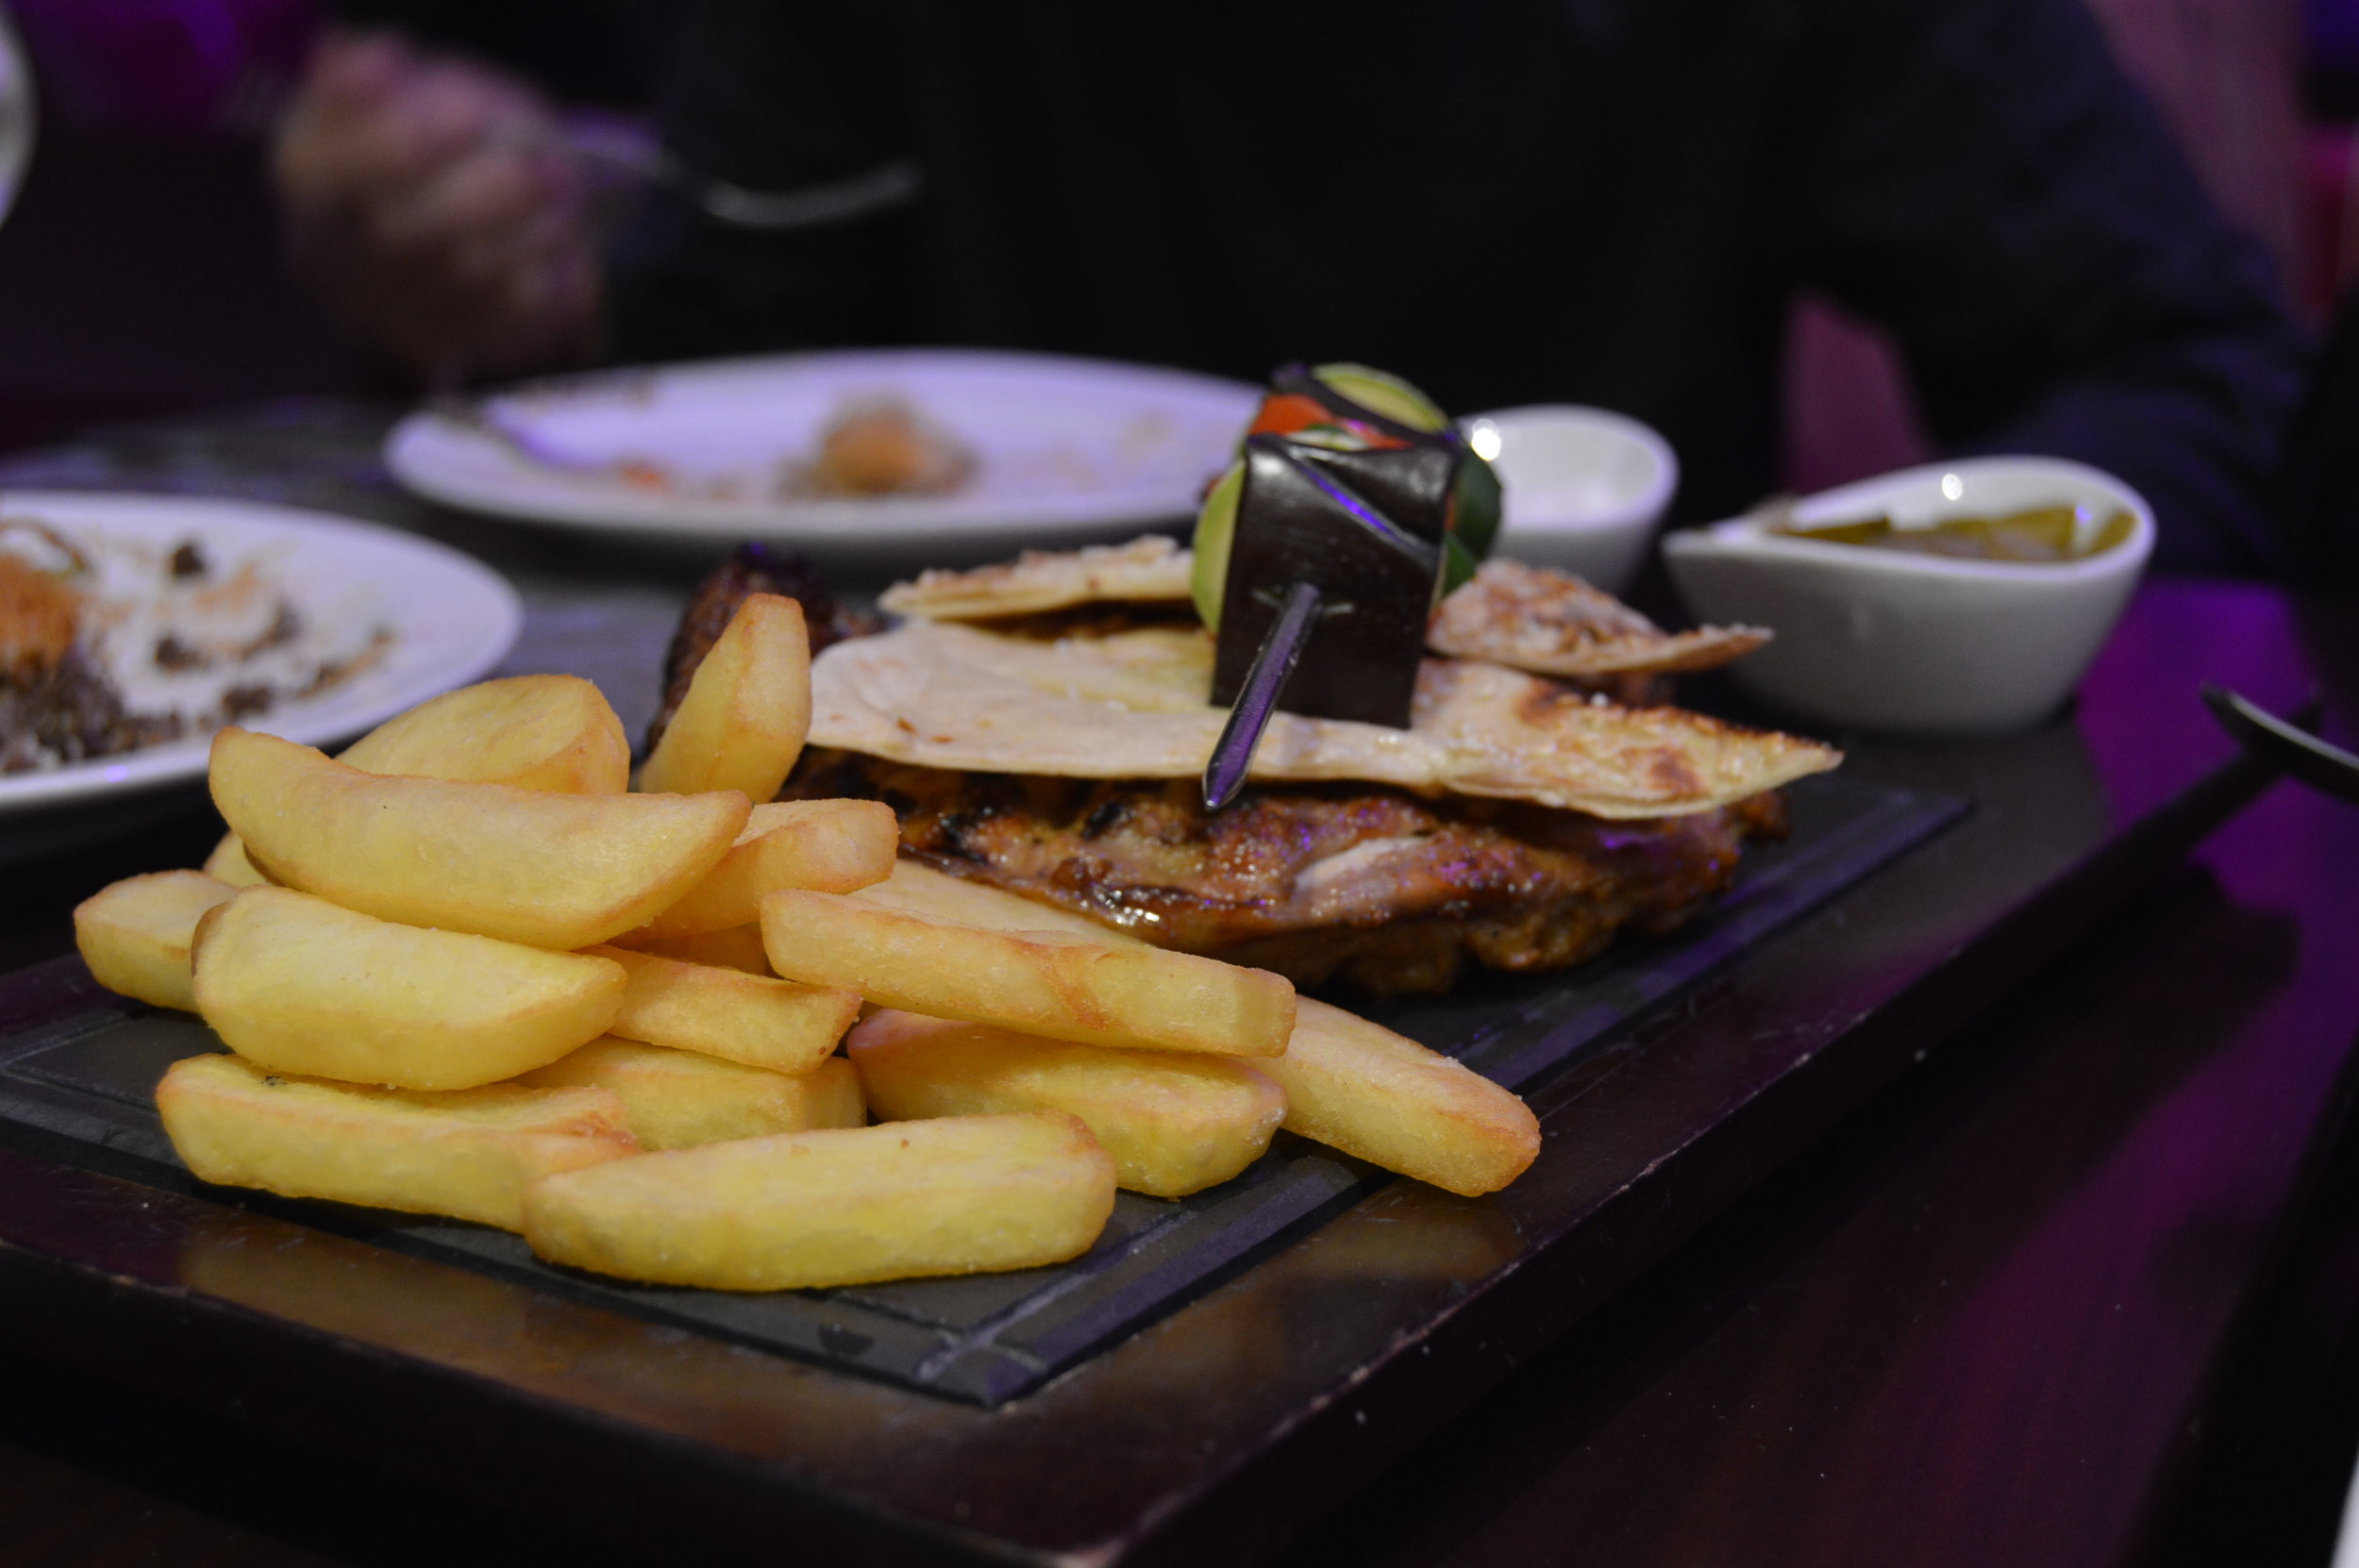 Lebanese dinner: - hummus, usmaleih, halloumi, garlic bread, grilled veggies and chicken